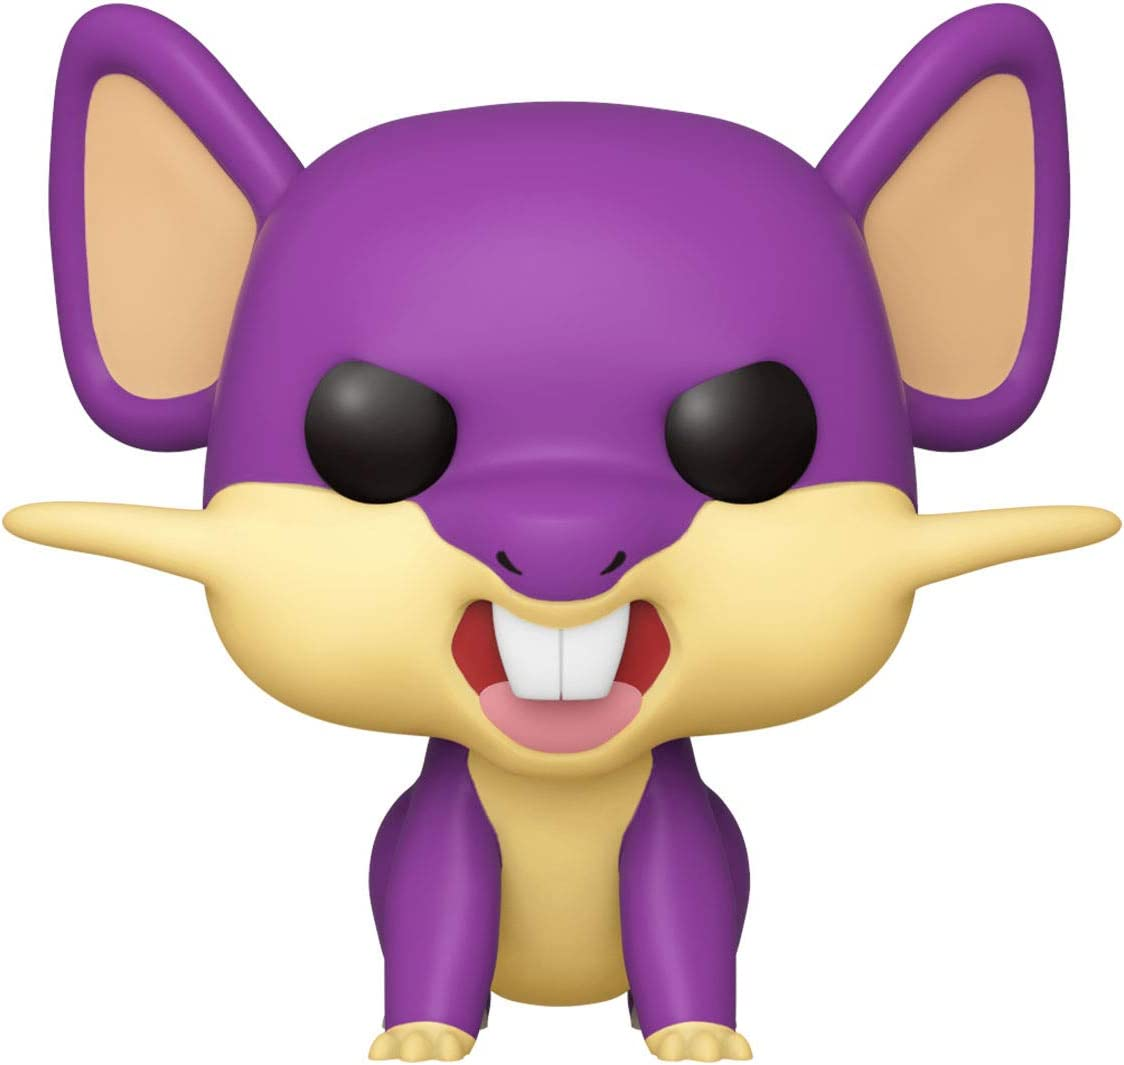 Growlithe Pokemon Collectors Set Series 3 Rattata Grumpy Pikachu Funko Games: POP Cubone